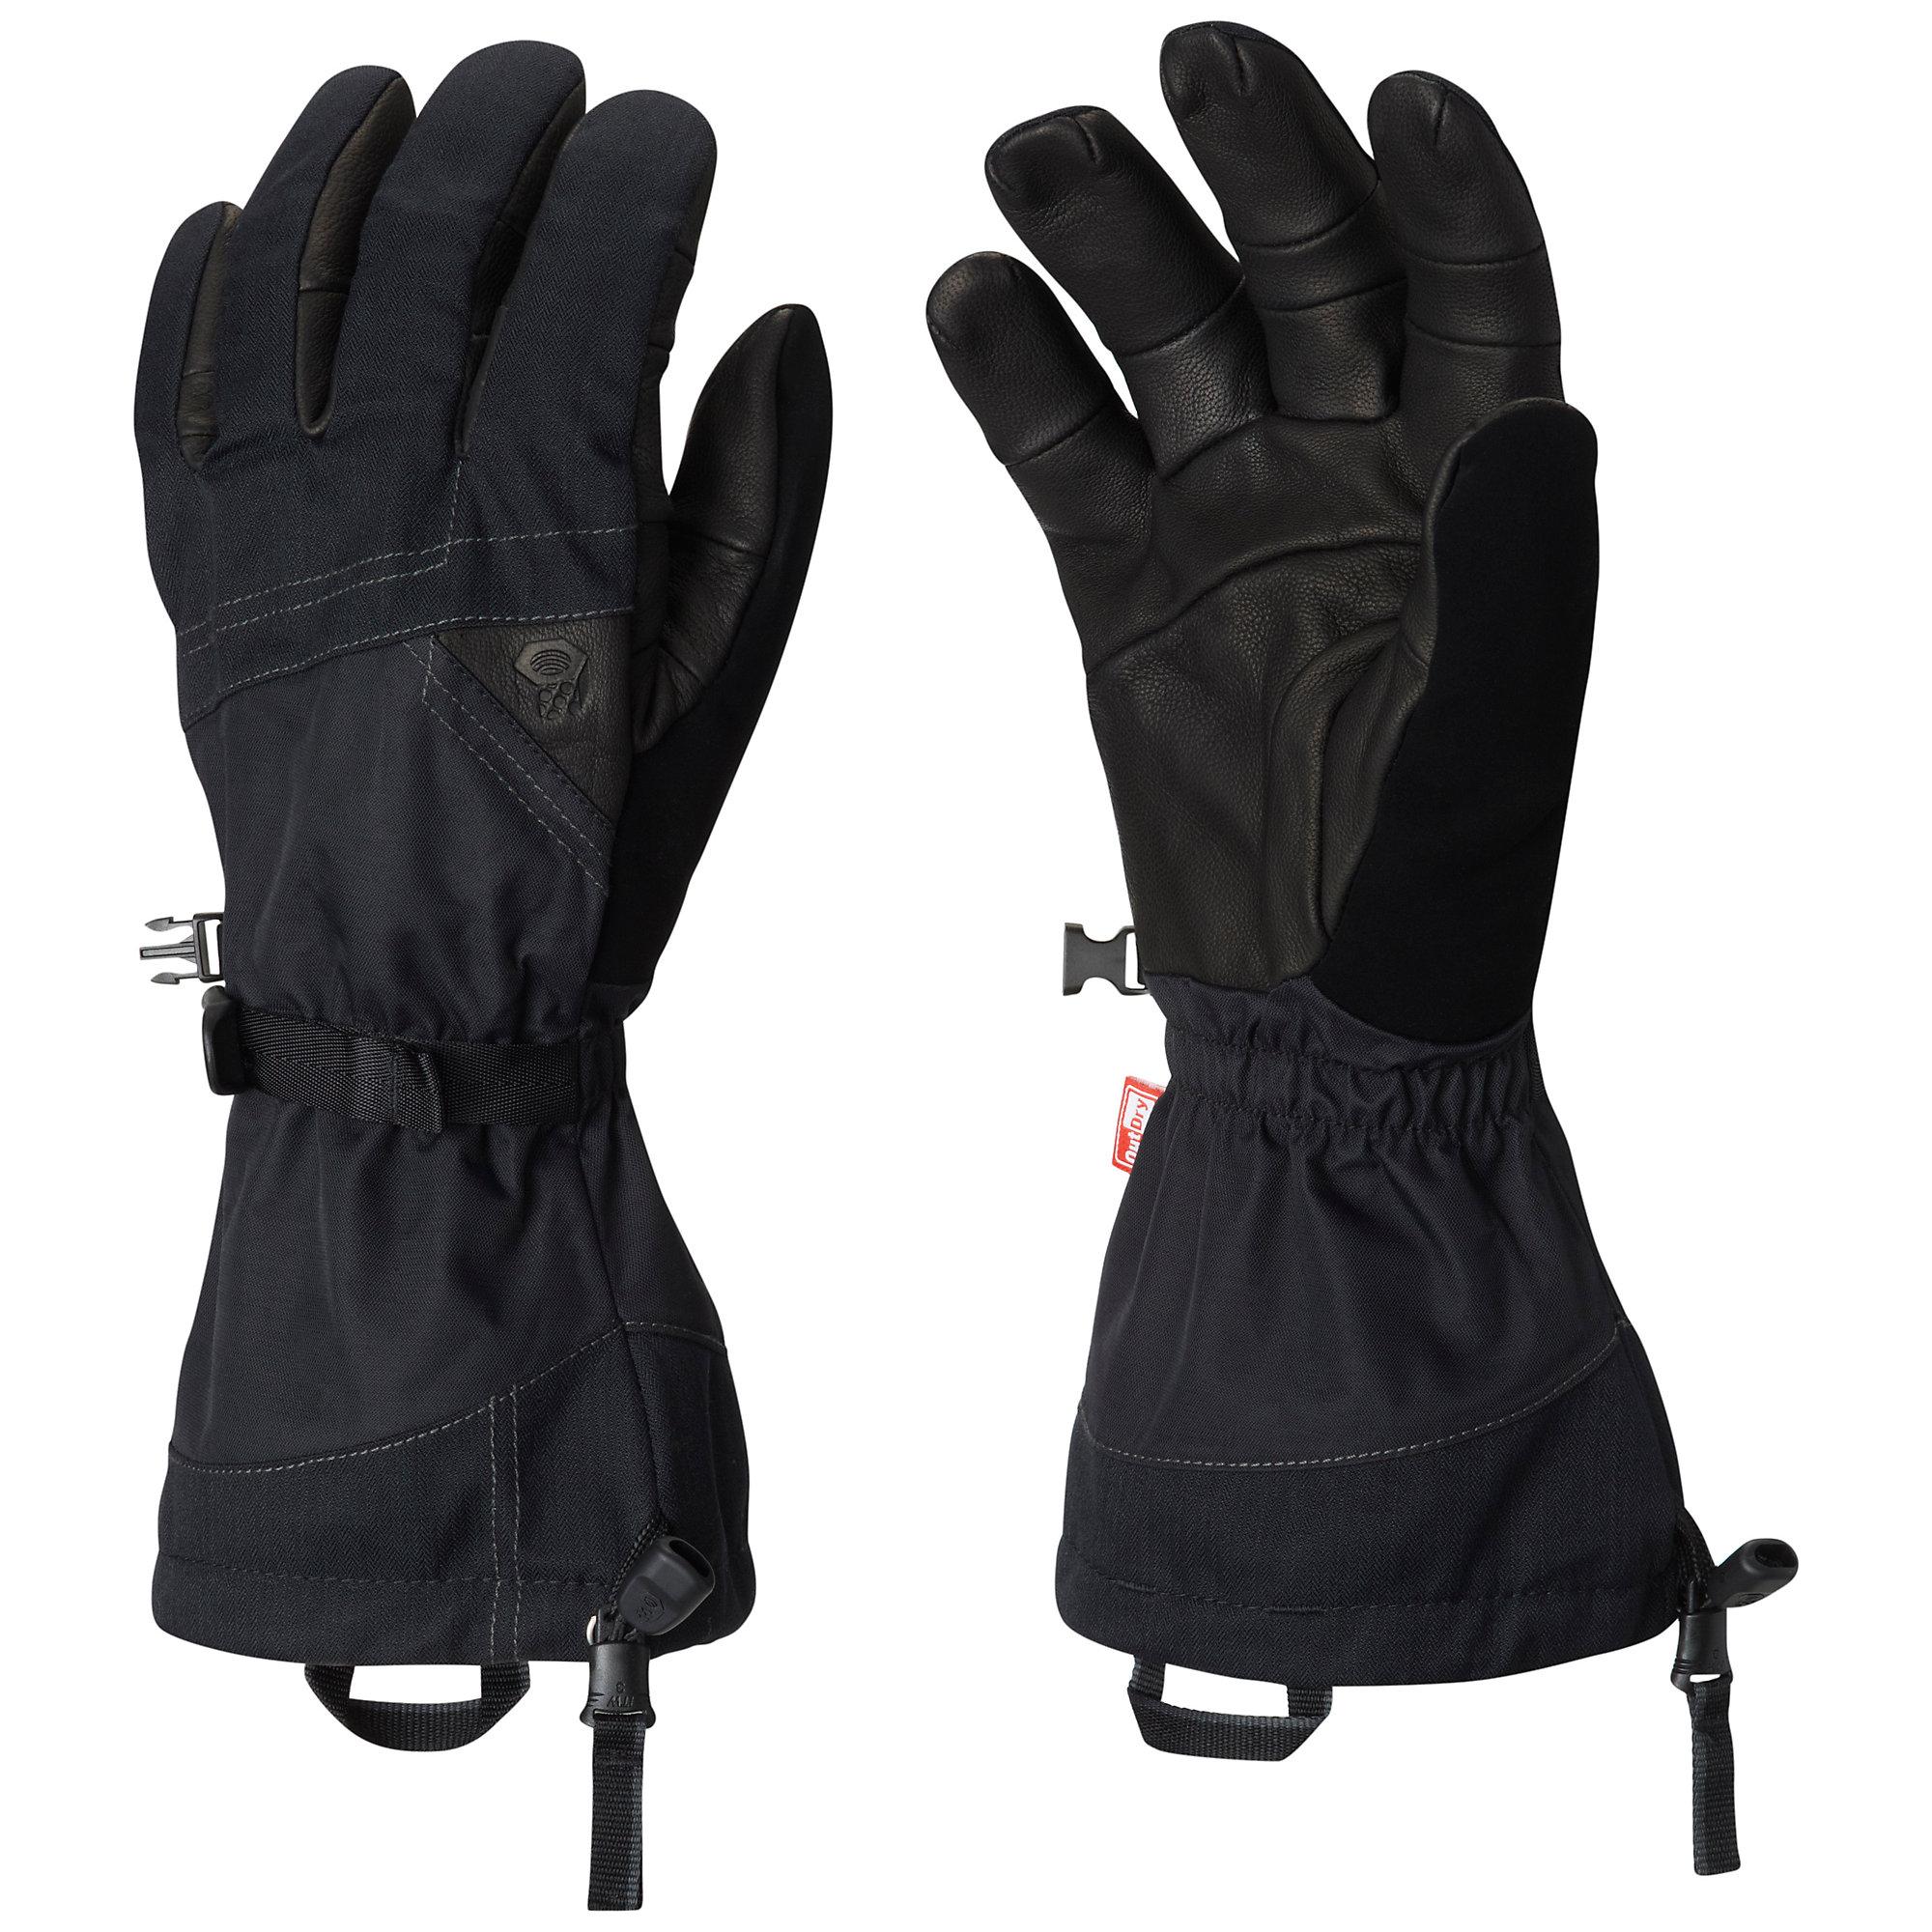 Mountain Hardwear Typhon OutDry Glove